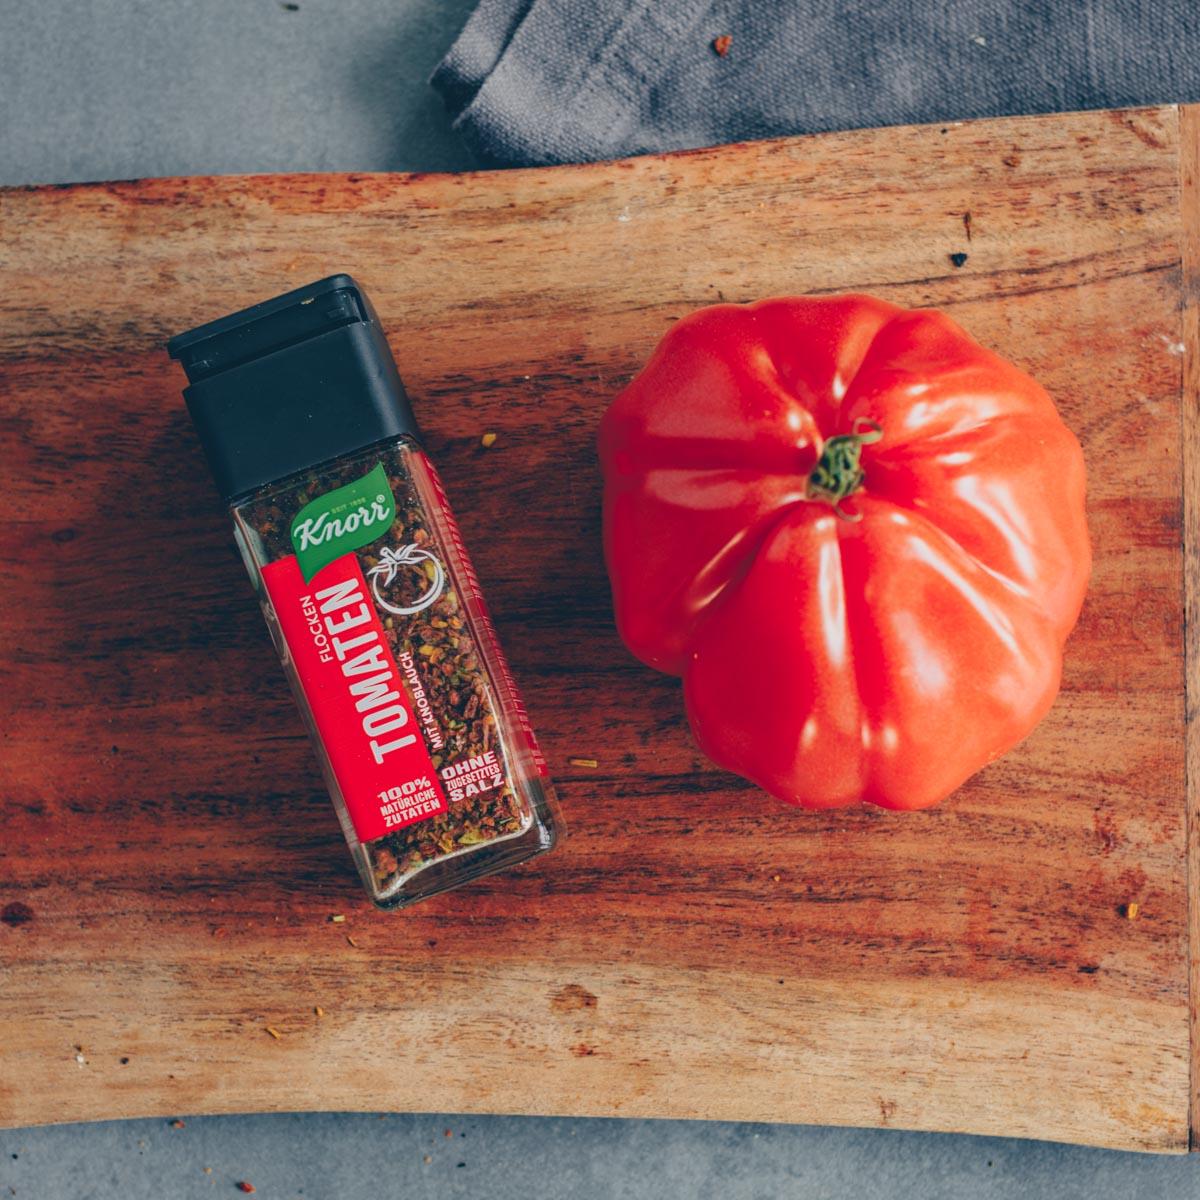 Knorr Tomatenflocken